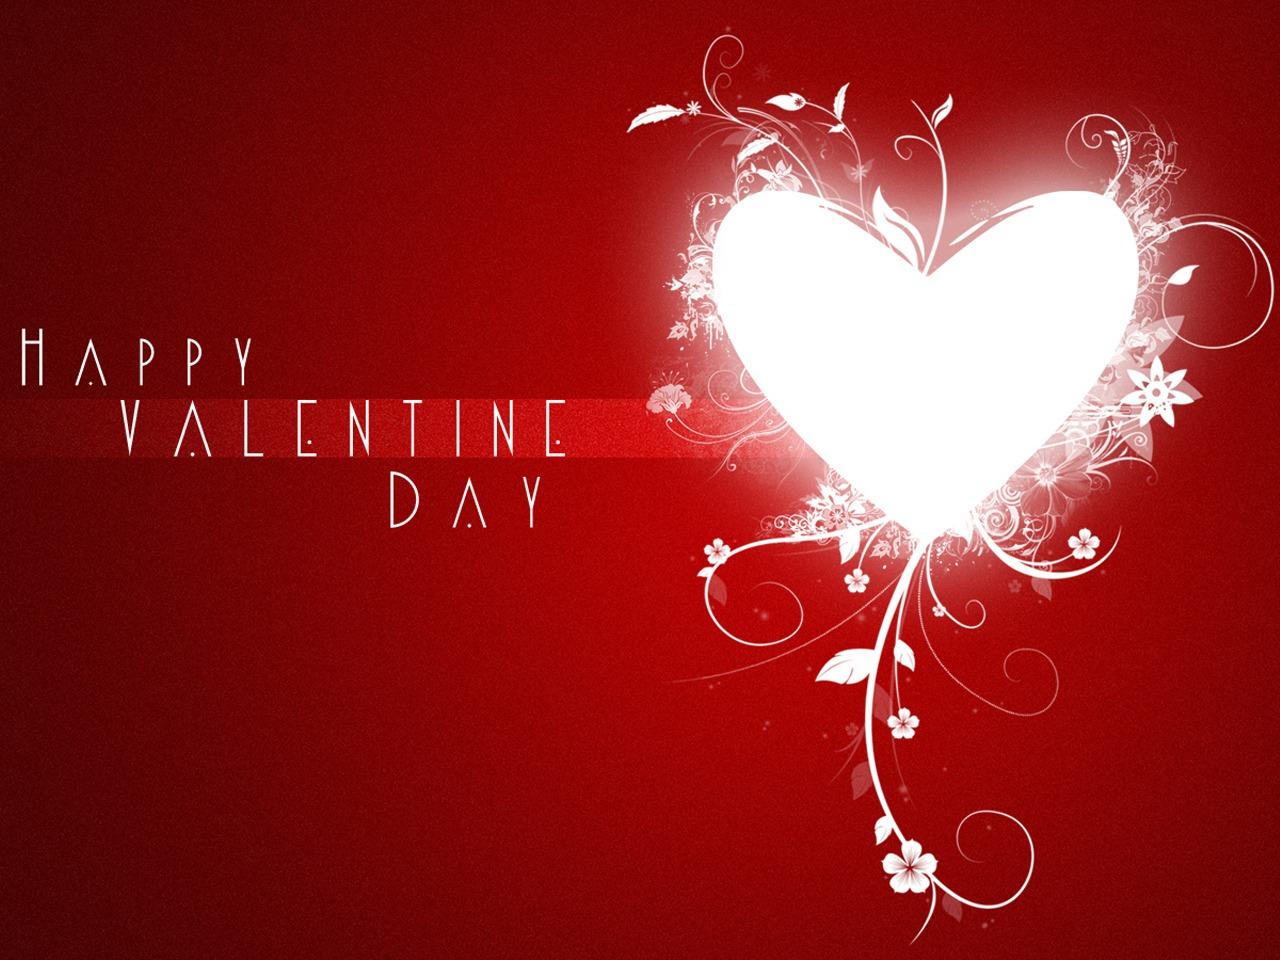 Happy Valentine's Day! | C.C. Hunter